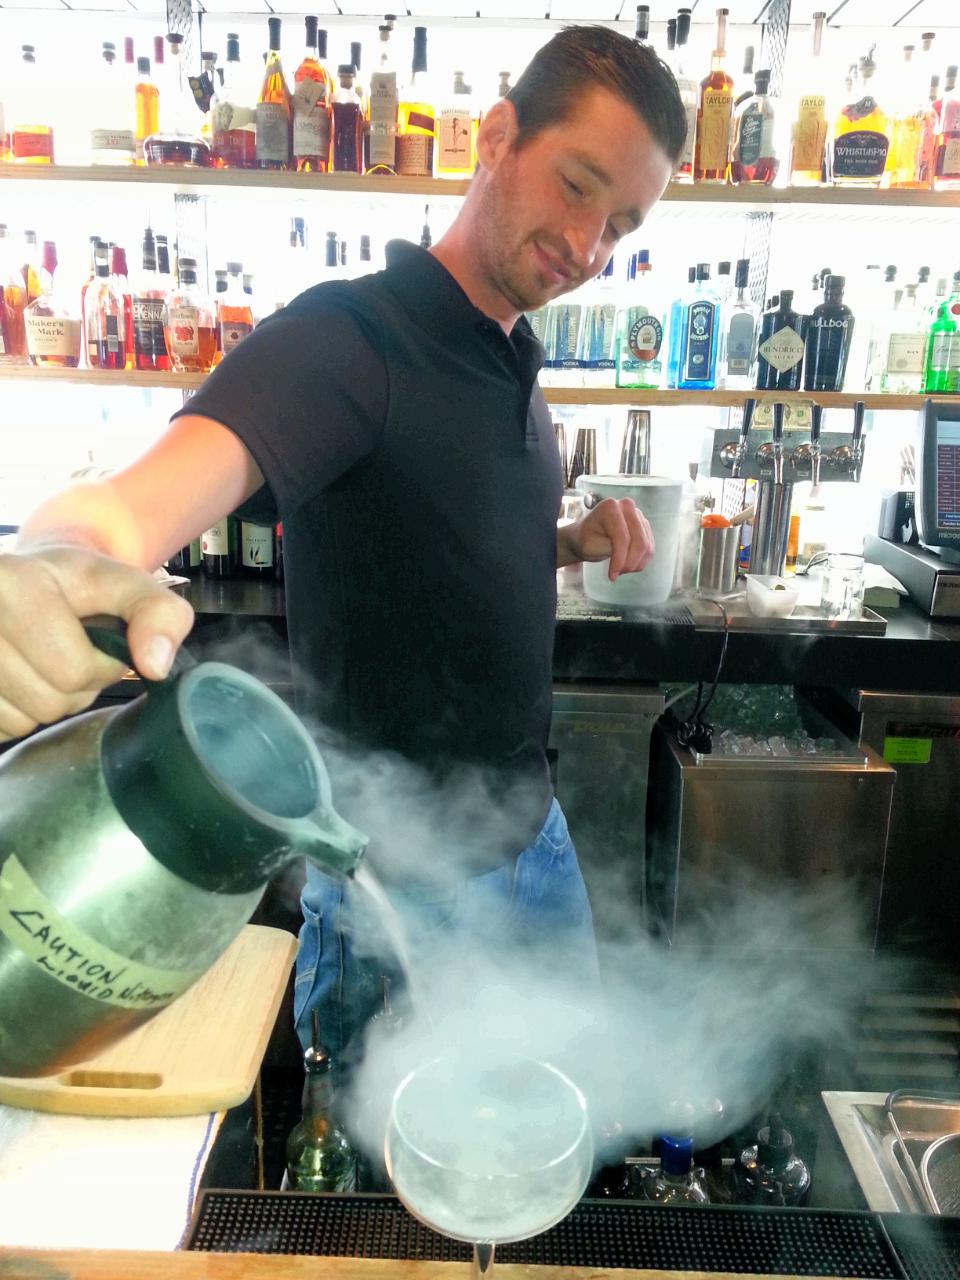 Beverage manager John Buckhalt uses liquid nitrogen to ensure a frosty glass / photo credit: Michael Mackie